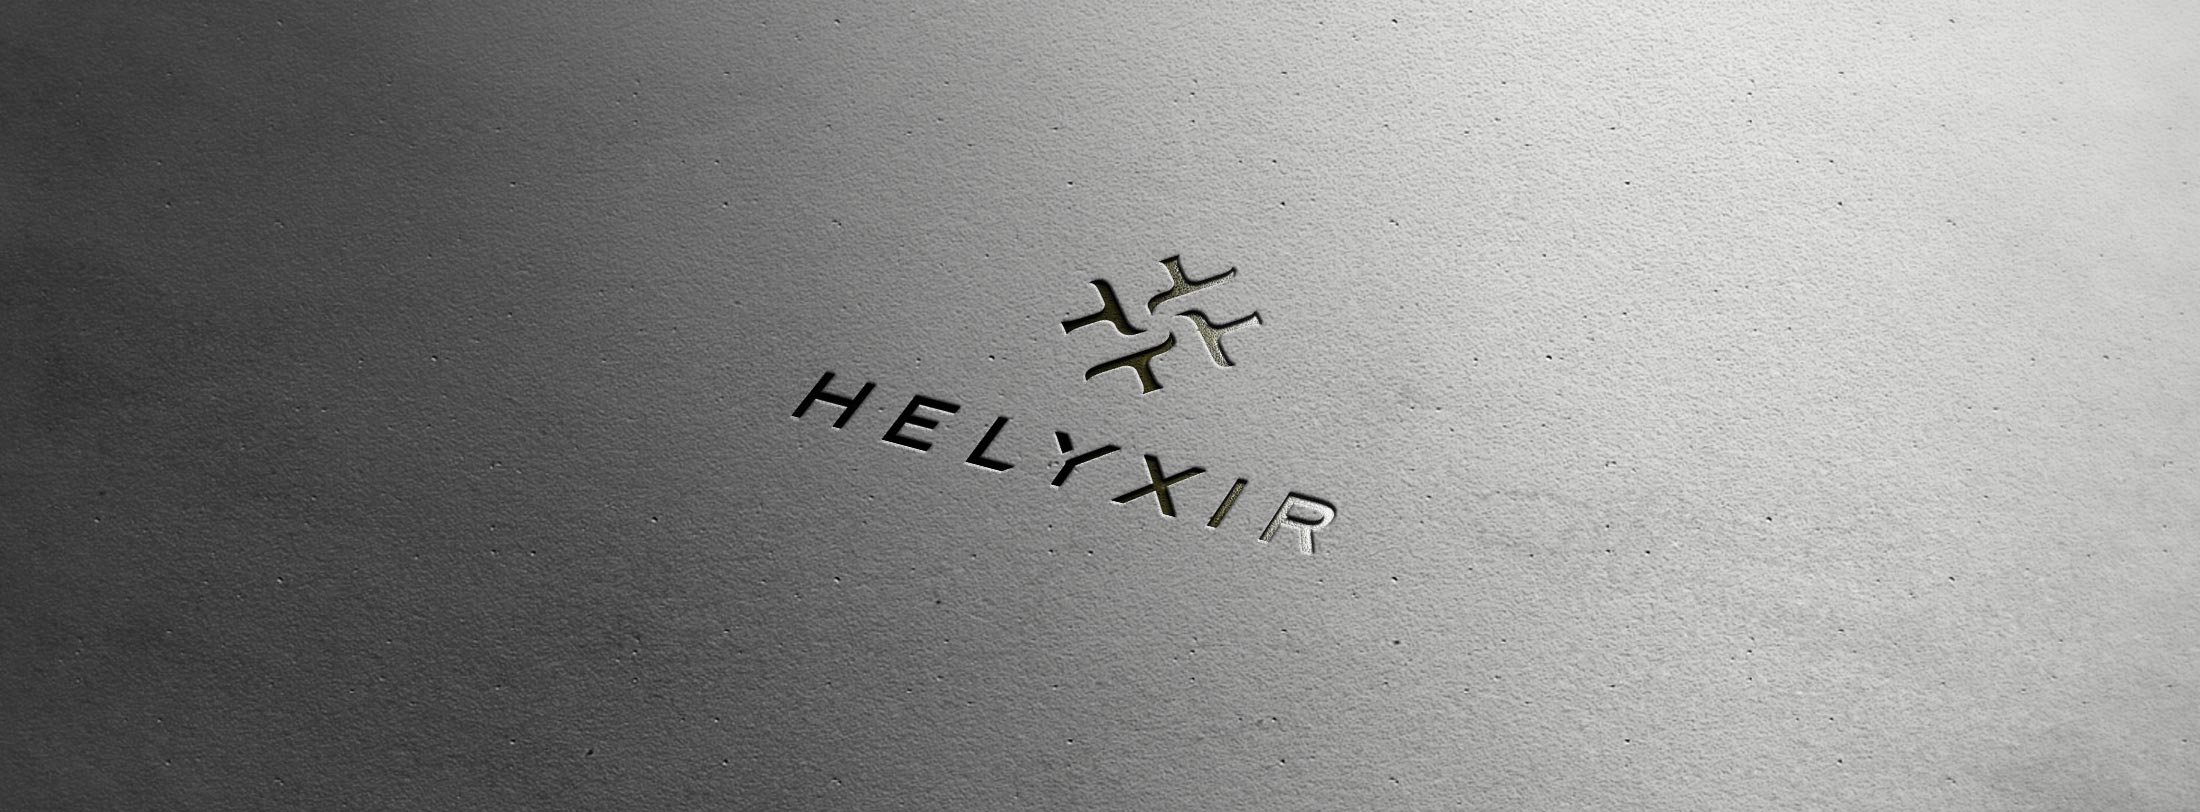 helyxir-osb-communication-logo-identite-visuelle-design-graphique-symbole-mokup